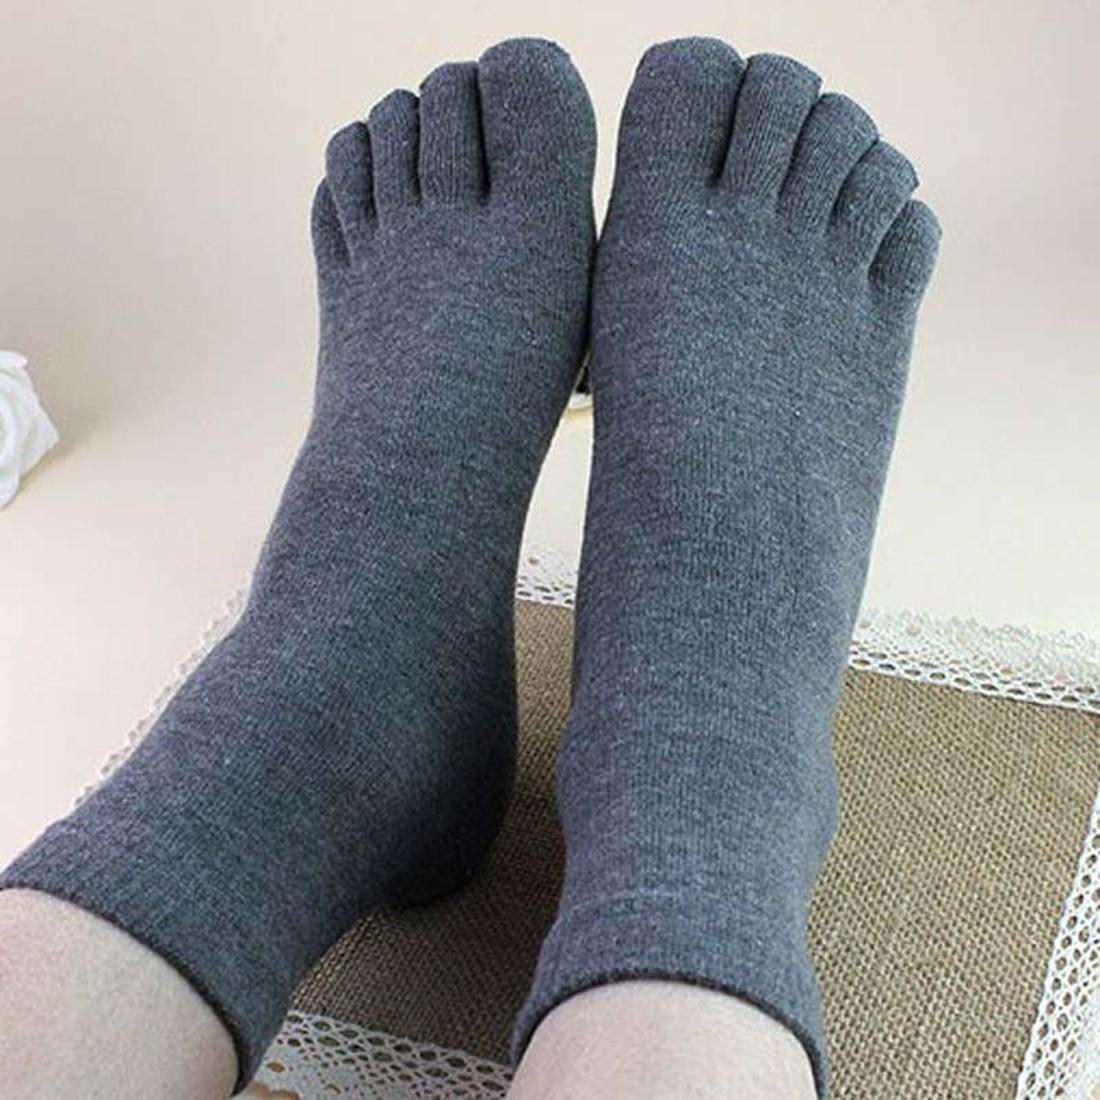 Hot Sale Men Women Comfortable Cotton Socks Funny Full Five Toe Socks Solid Color Winter Warm Crew Five Finger Socks Black White